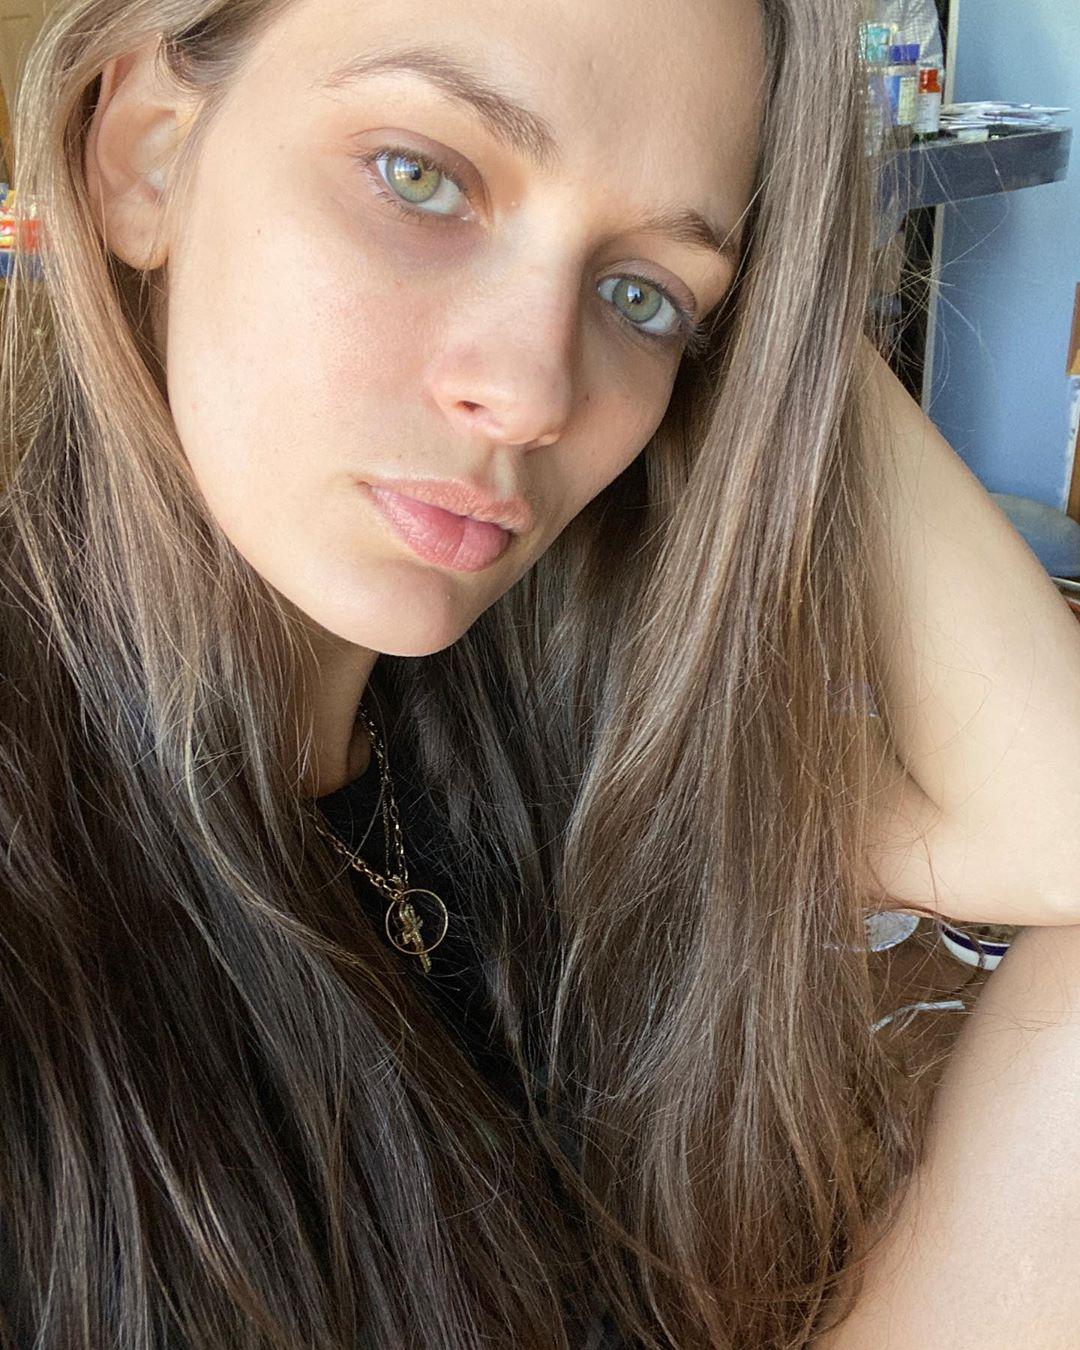 Jessica-Dykstra-Wallpapers-Insta-Fit-Bio-3